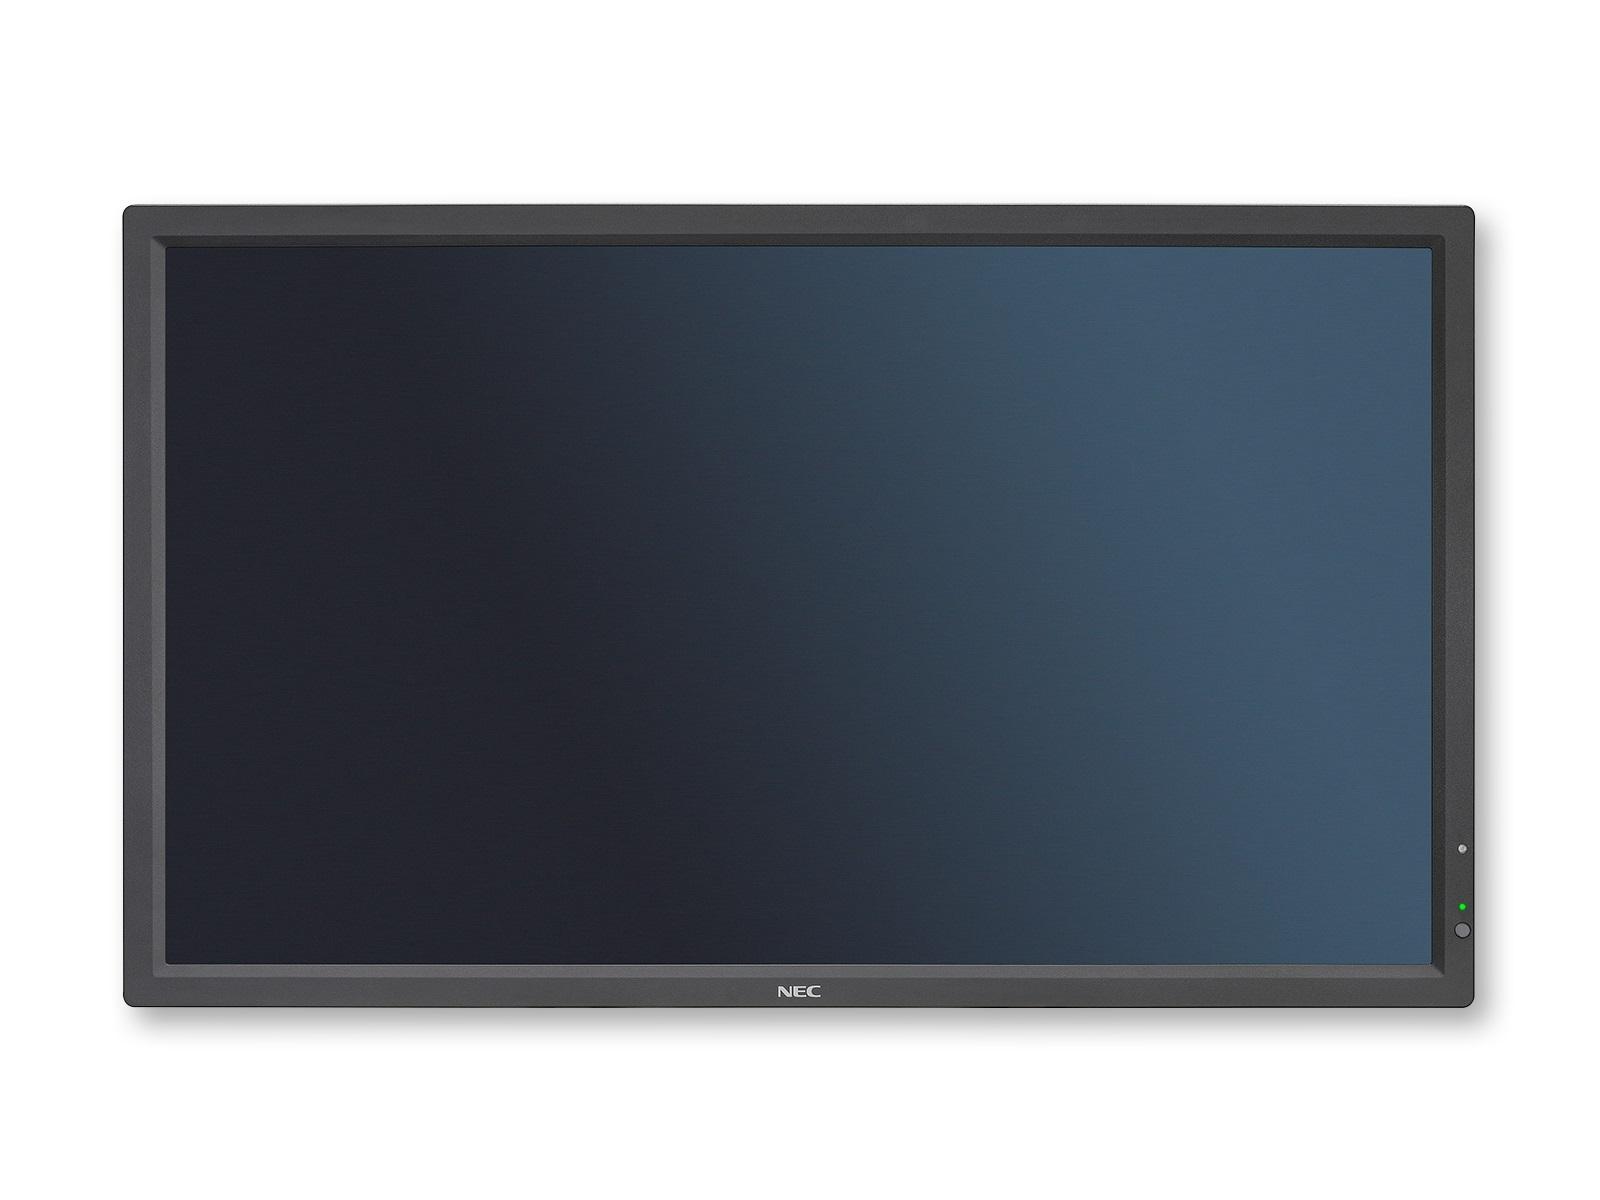 "NEC LFD 32"" MuSy V323-2 LCD S-IPS Edge LED,1920x1080,max450 cd,1300:1,25ms,DVI+HDMI+DP+VGA+BNC+S-VIDEO,audio,bez stoj"